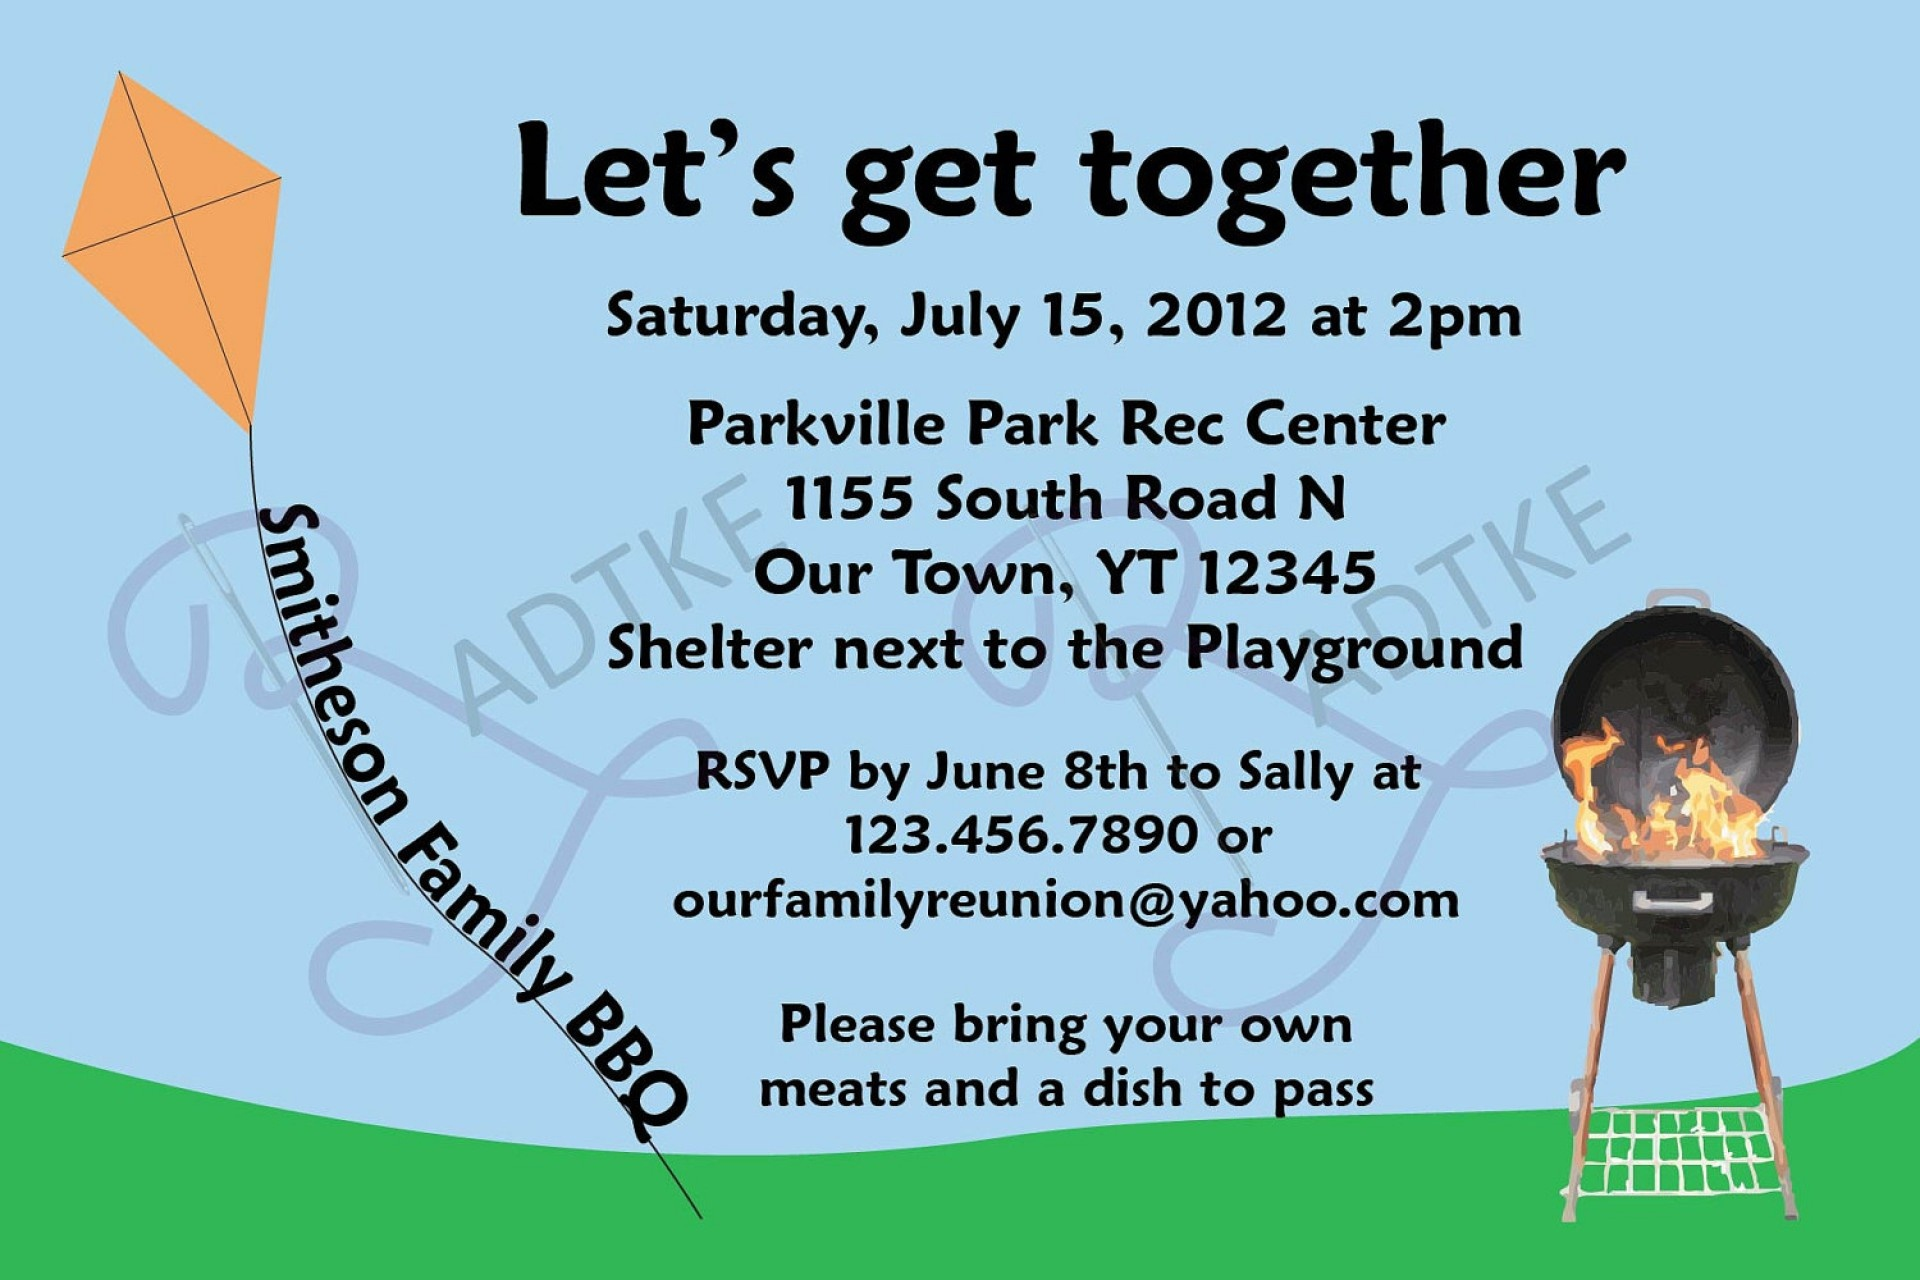 015 Free Printable Family Reunion Invitation 0 Template Ideas - Free Printable Family Reunion Invitations